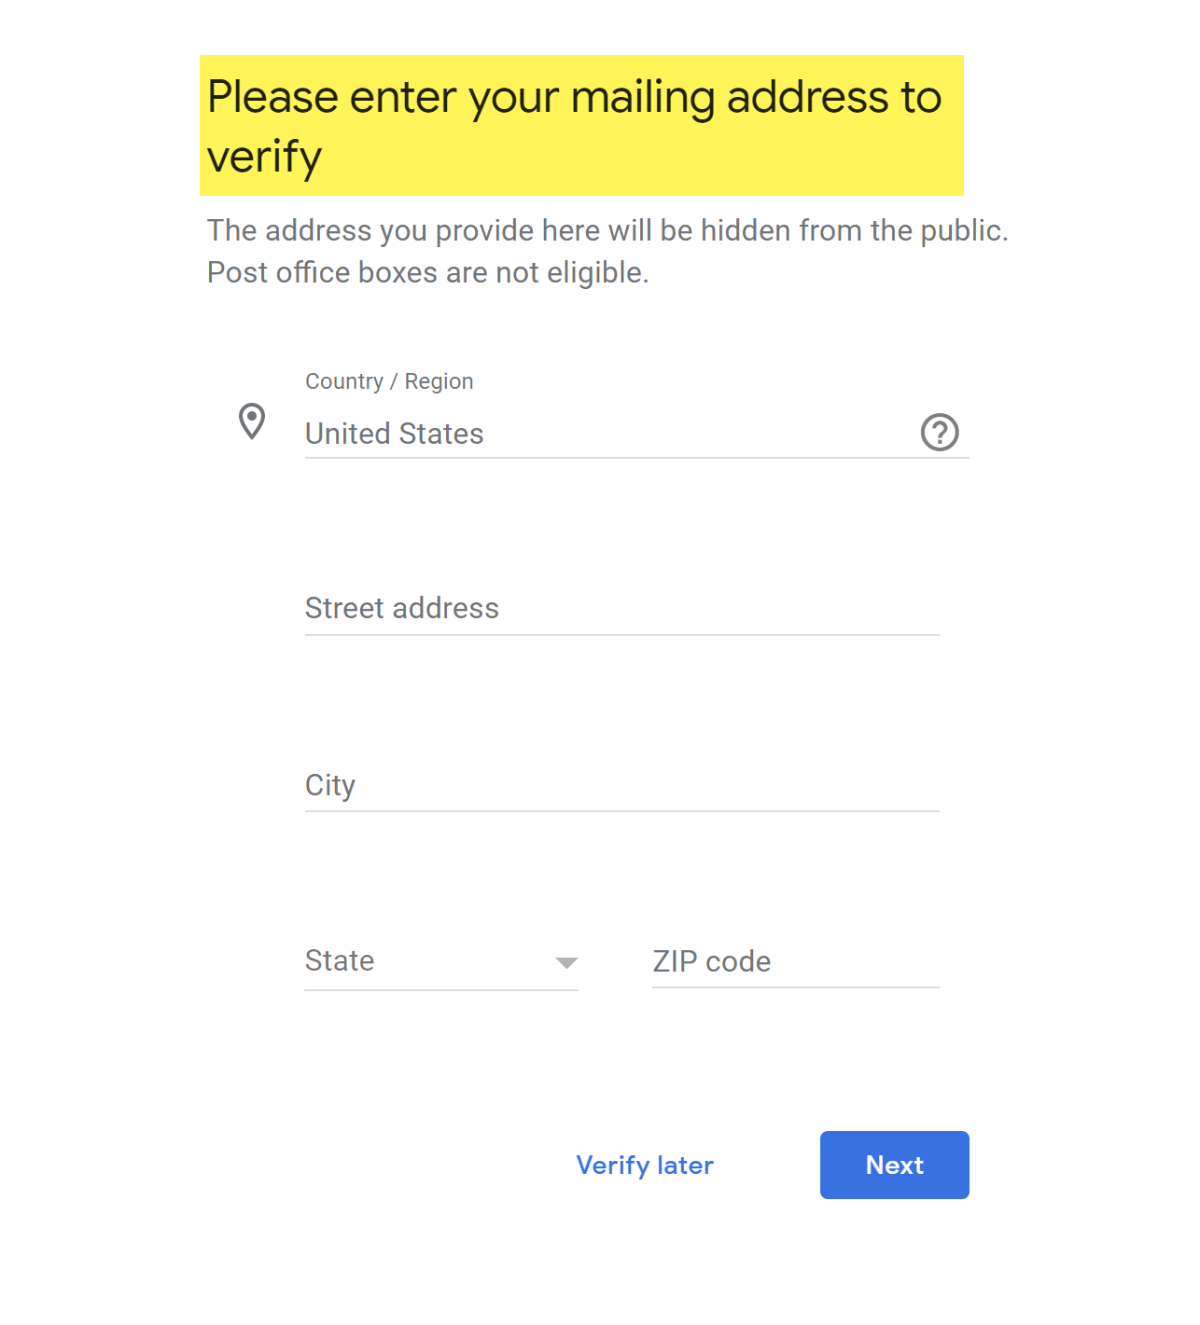 Enter a valid address to get PIN postcard.